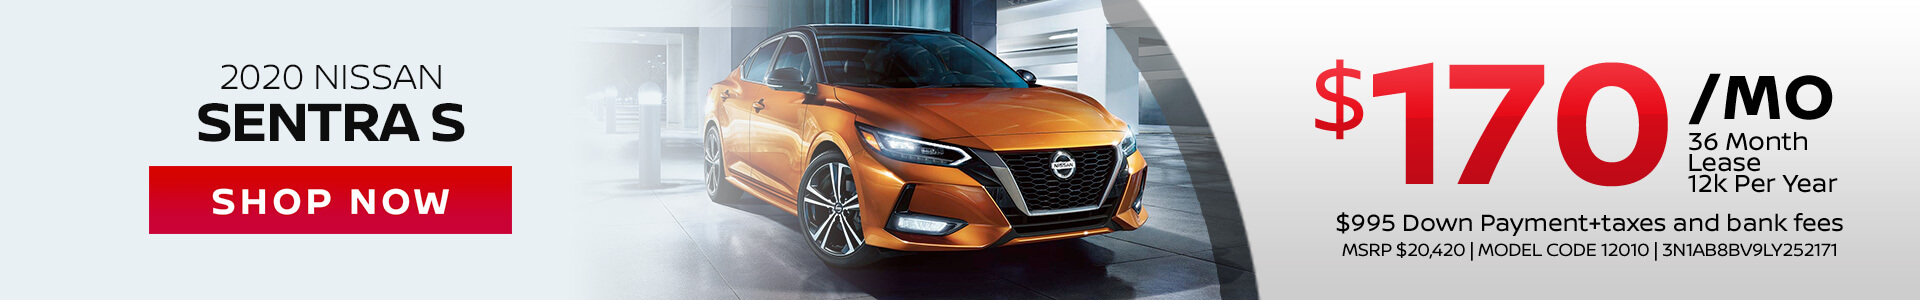 Nissan Sentra $170 Lease